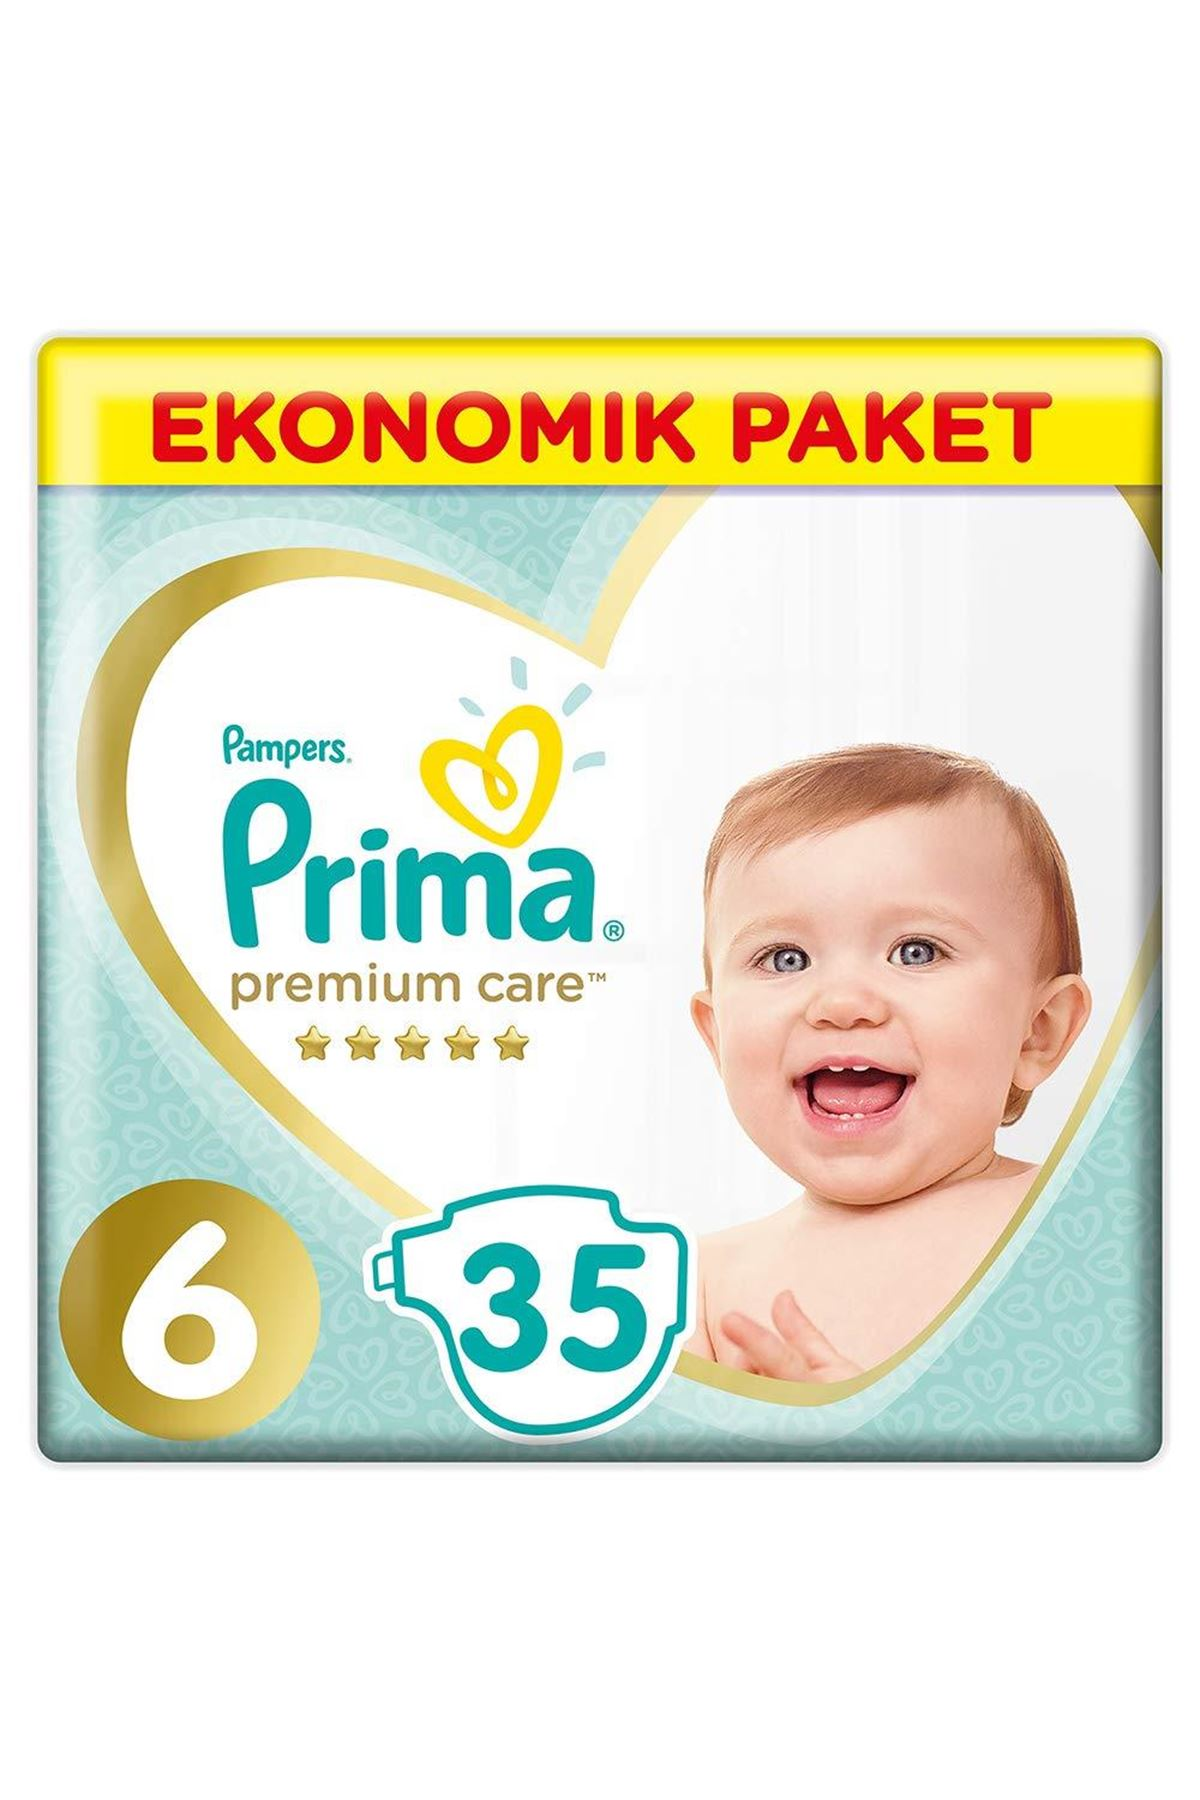 Prima Premium Care Bebek Bezi Ekonomik Paket 6 Beden 35 Adet